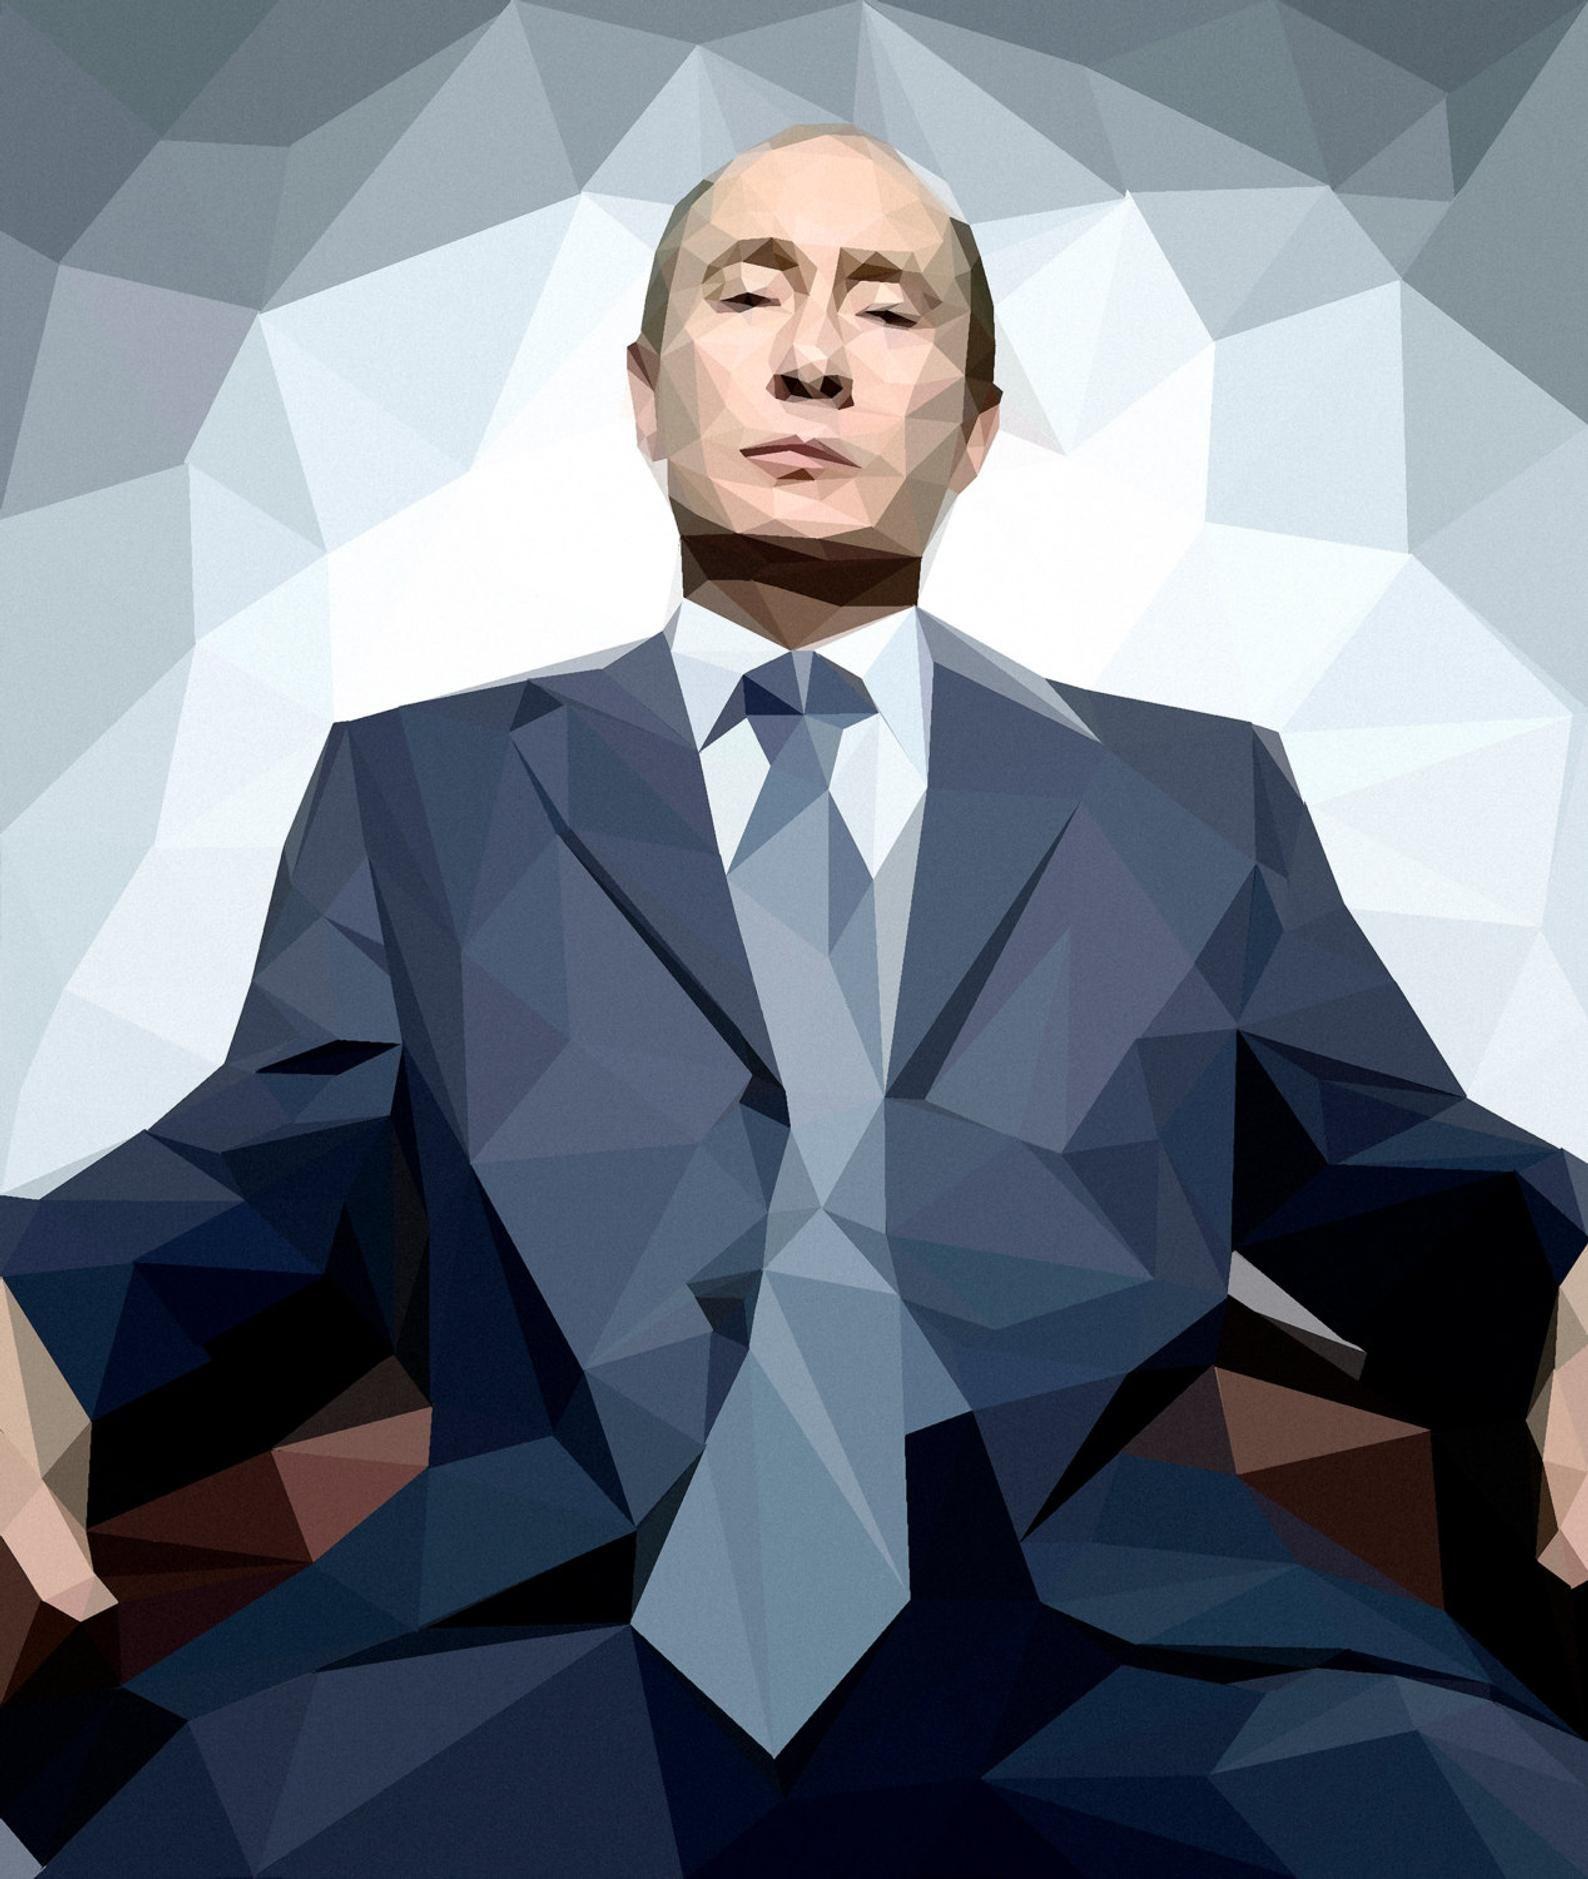 V Putin In Geometris Style Paper Print Original Etsy In 2020 Illustration Print Print Printed Paper